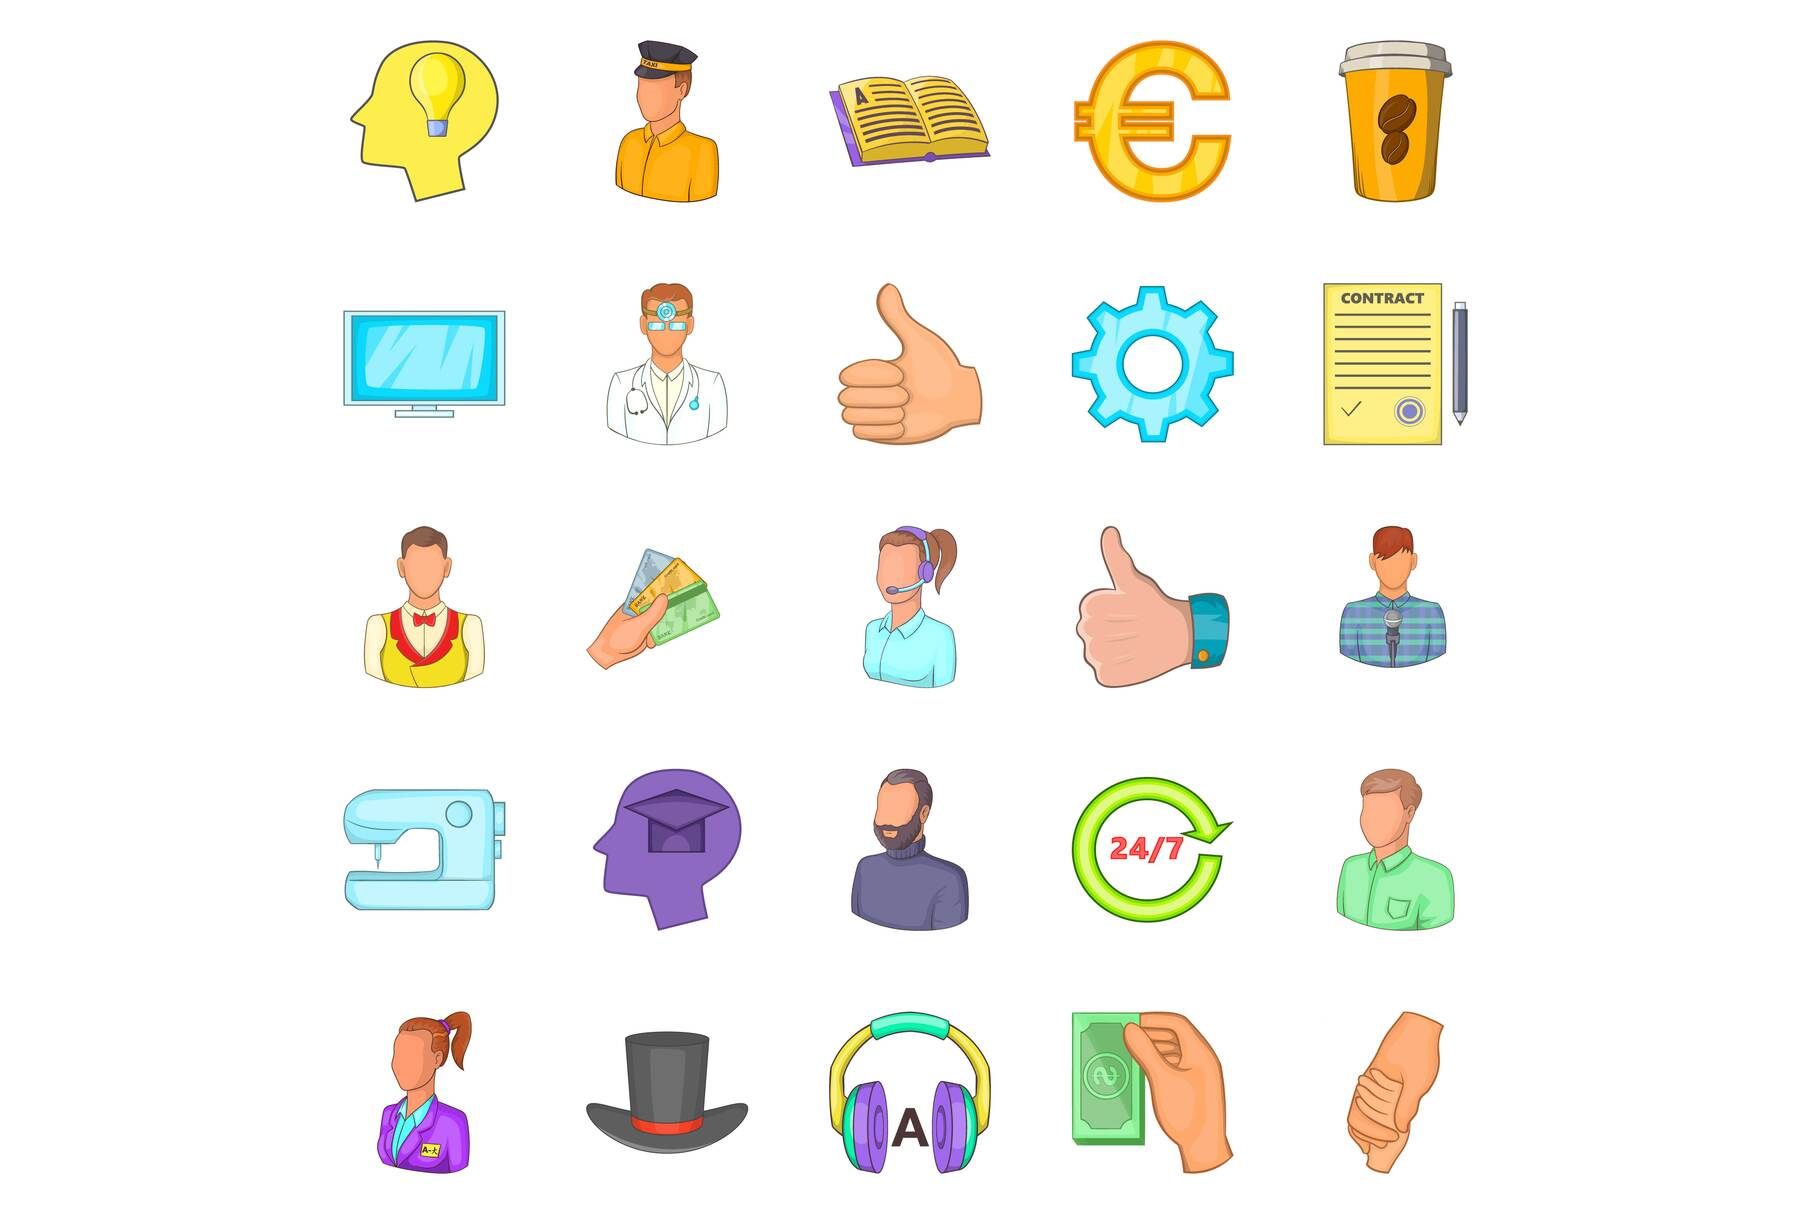 Offshore icons set, cartoon style example image 1